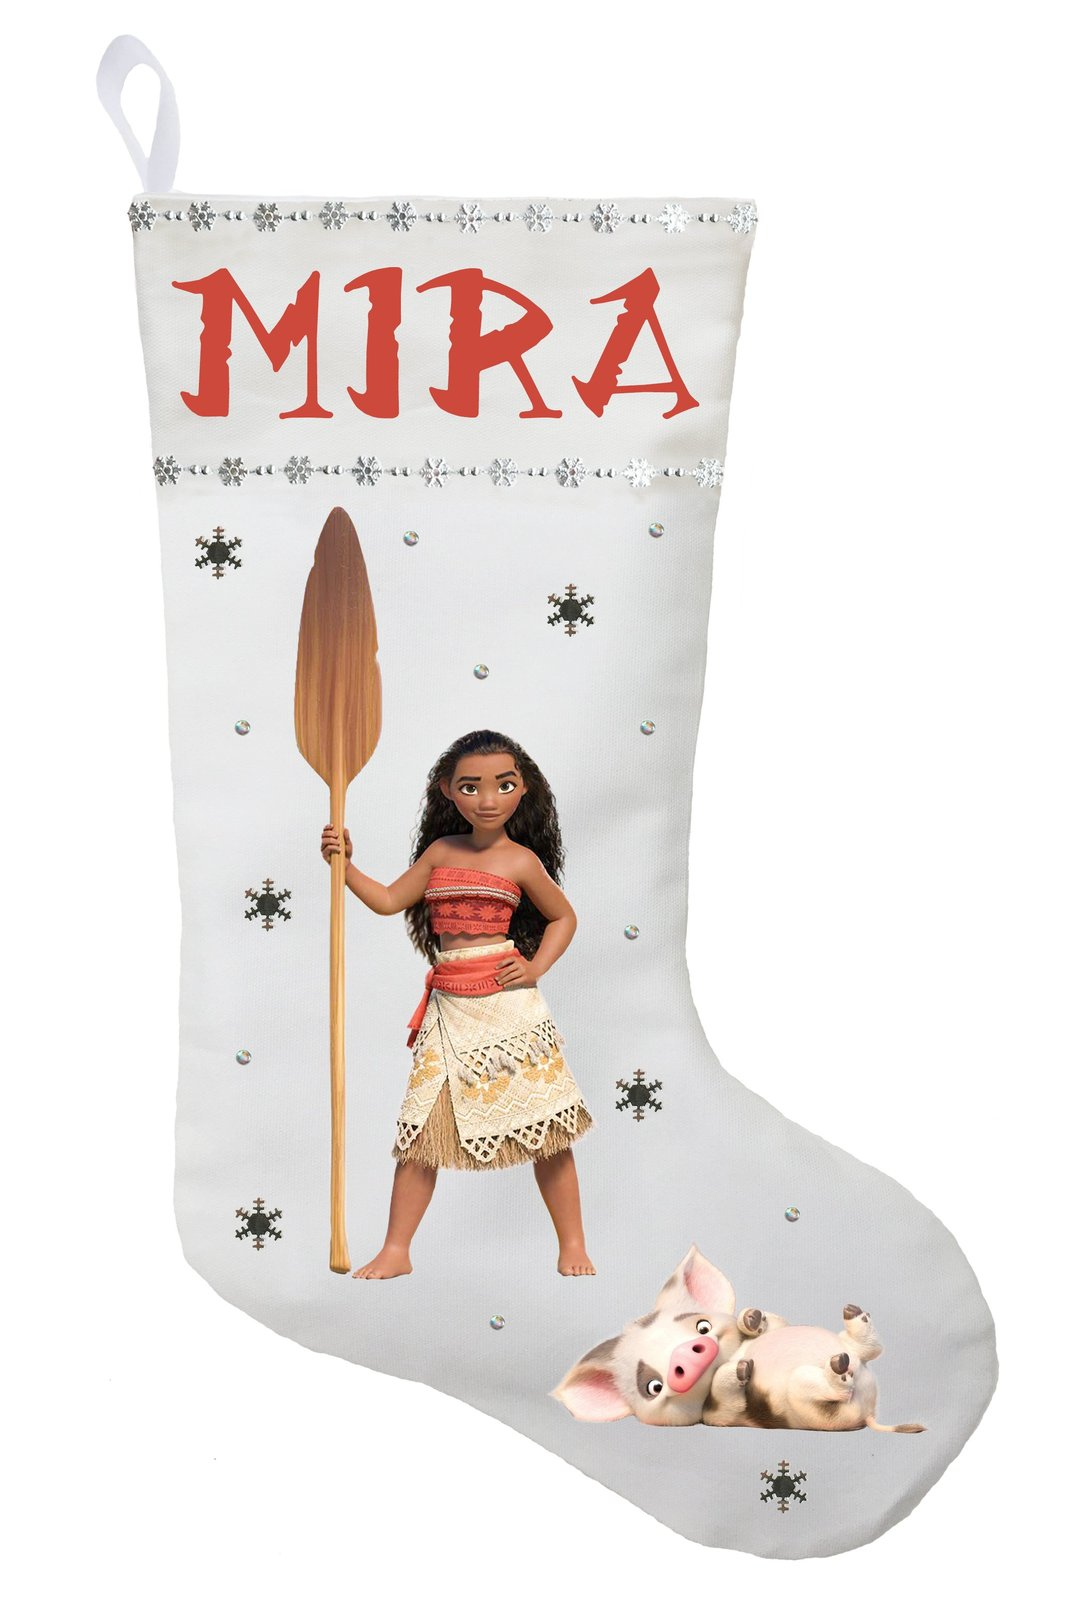 Moana Christmas Stocking - Personalized and Hand Princess Moana Stocking